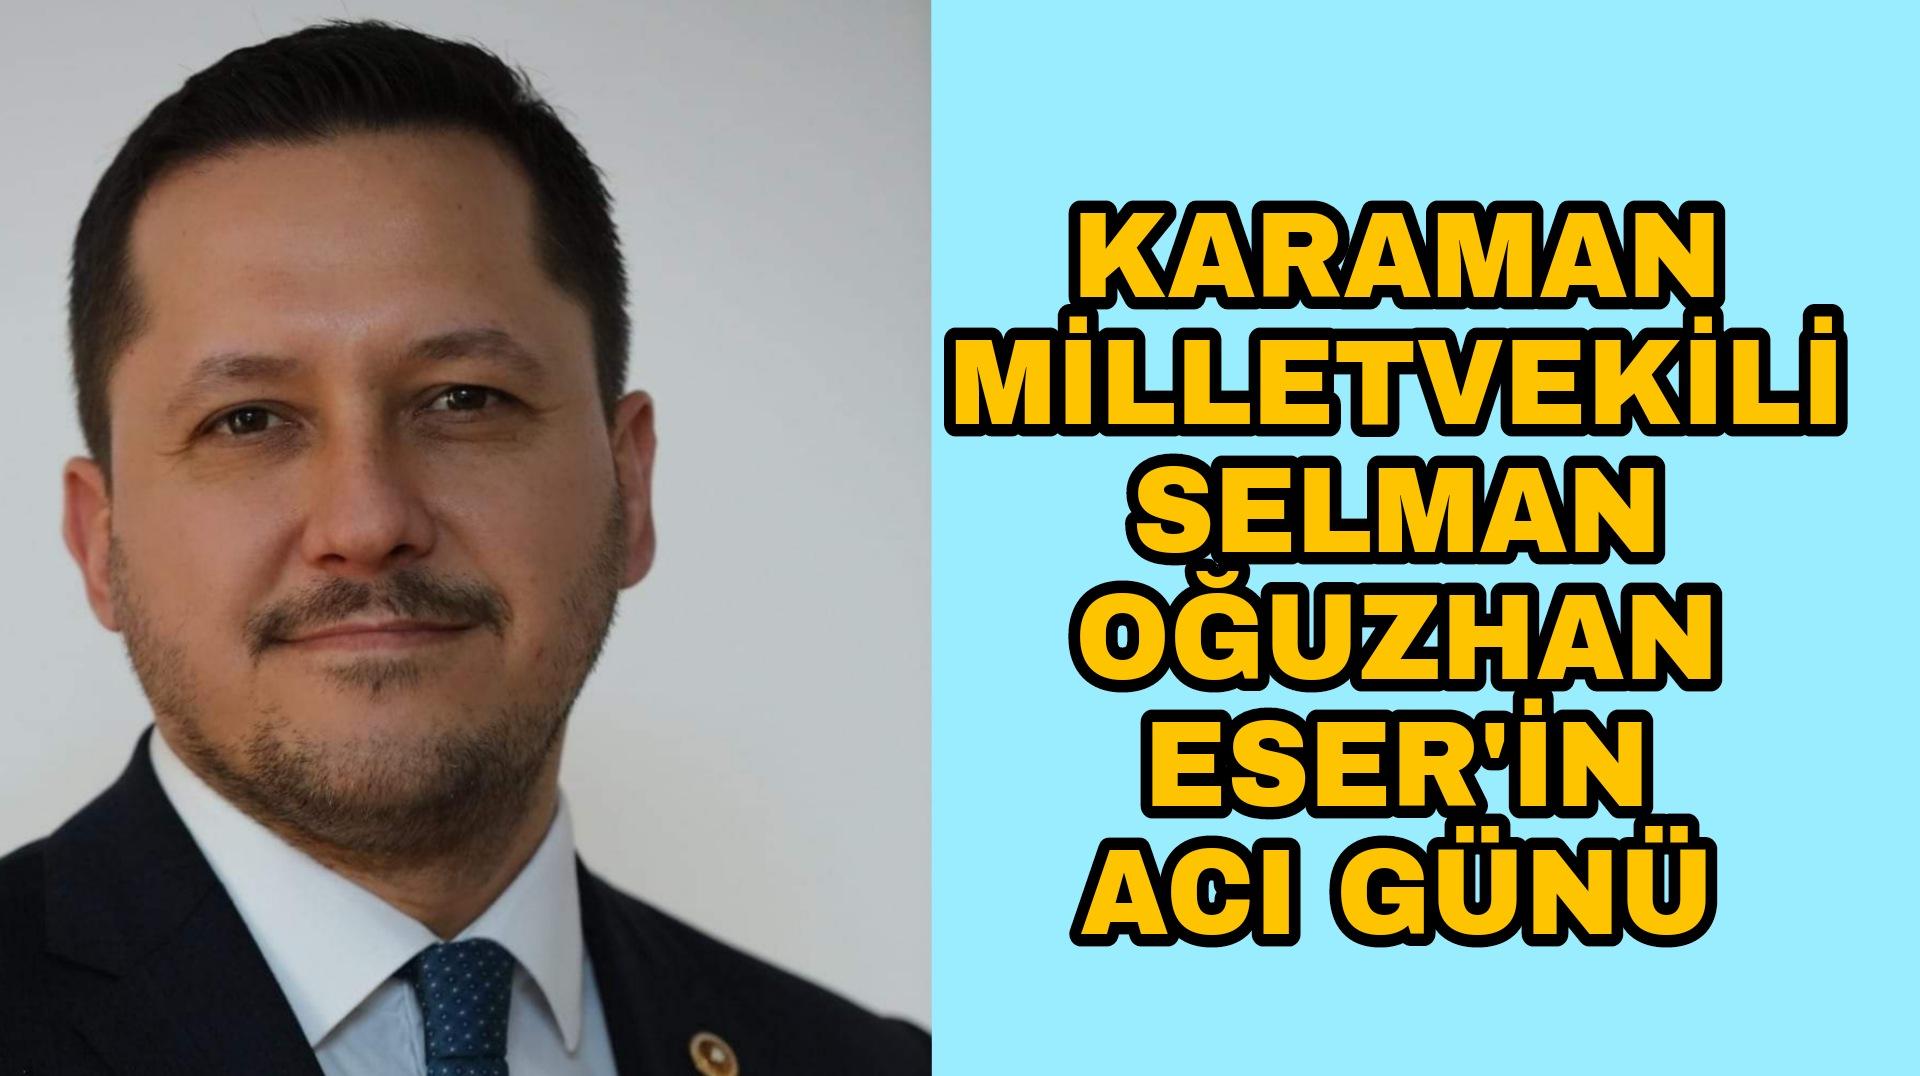 Karaman Milletvekili Selman Oğuzhan Eser'den acı günü